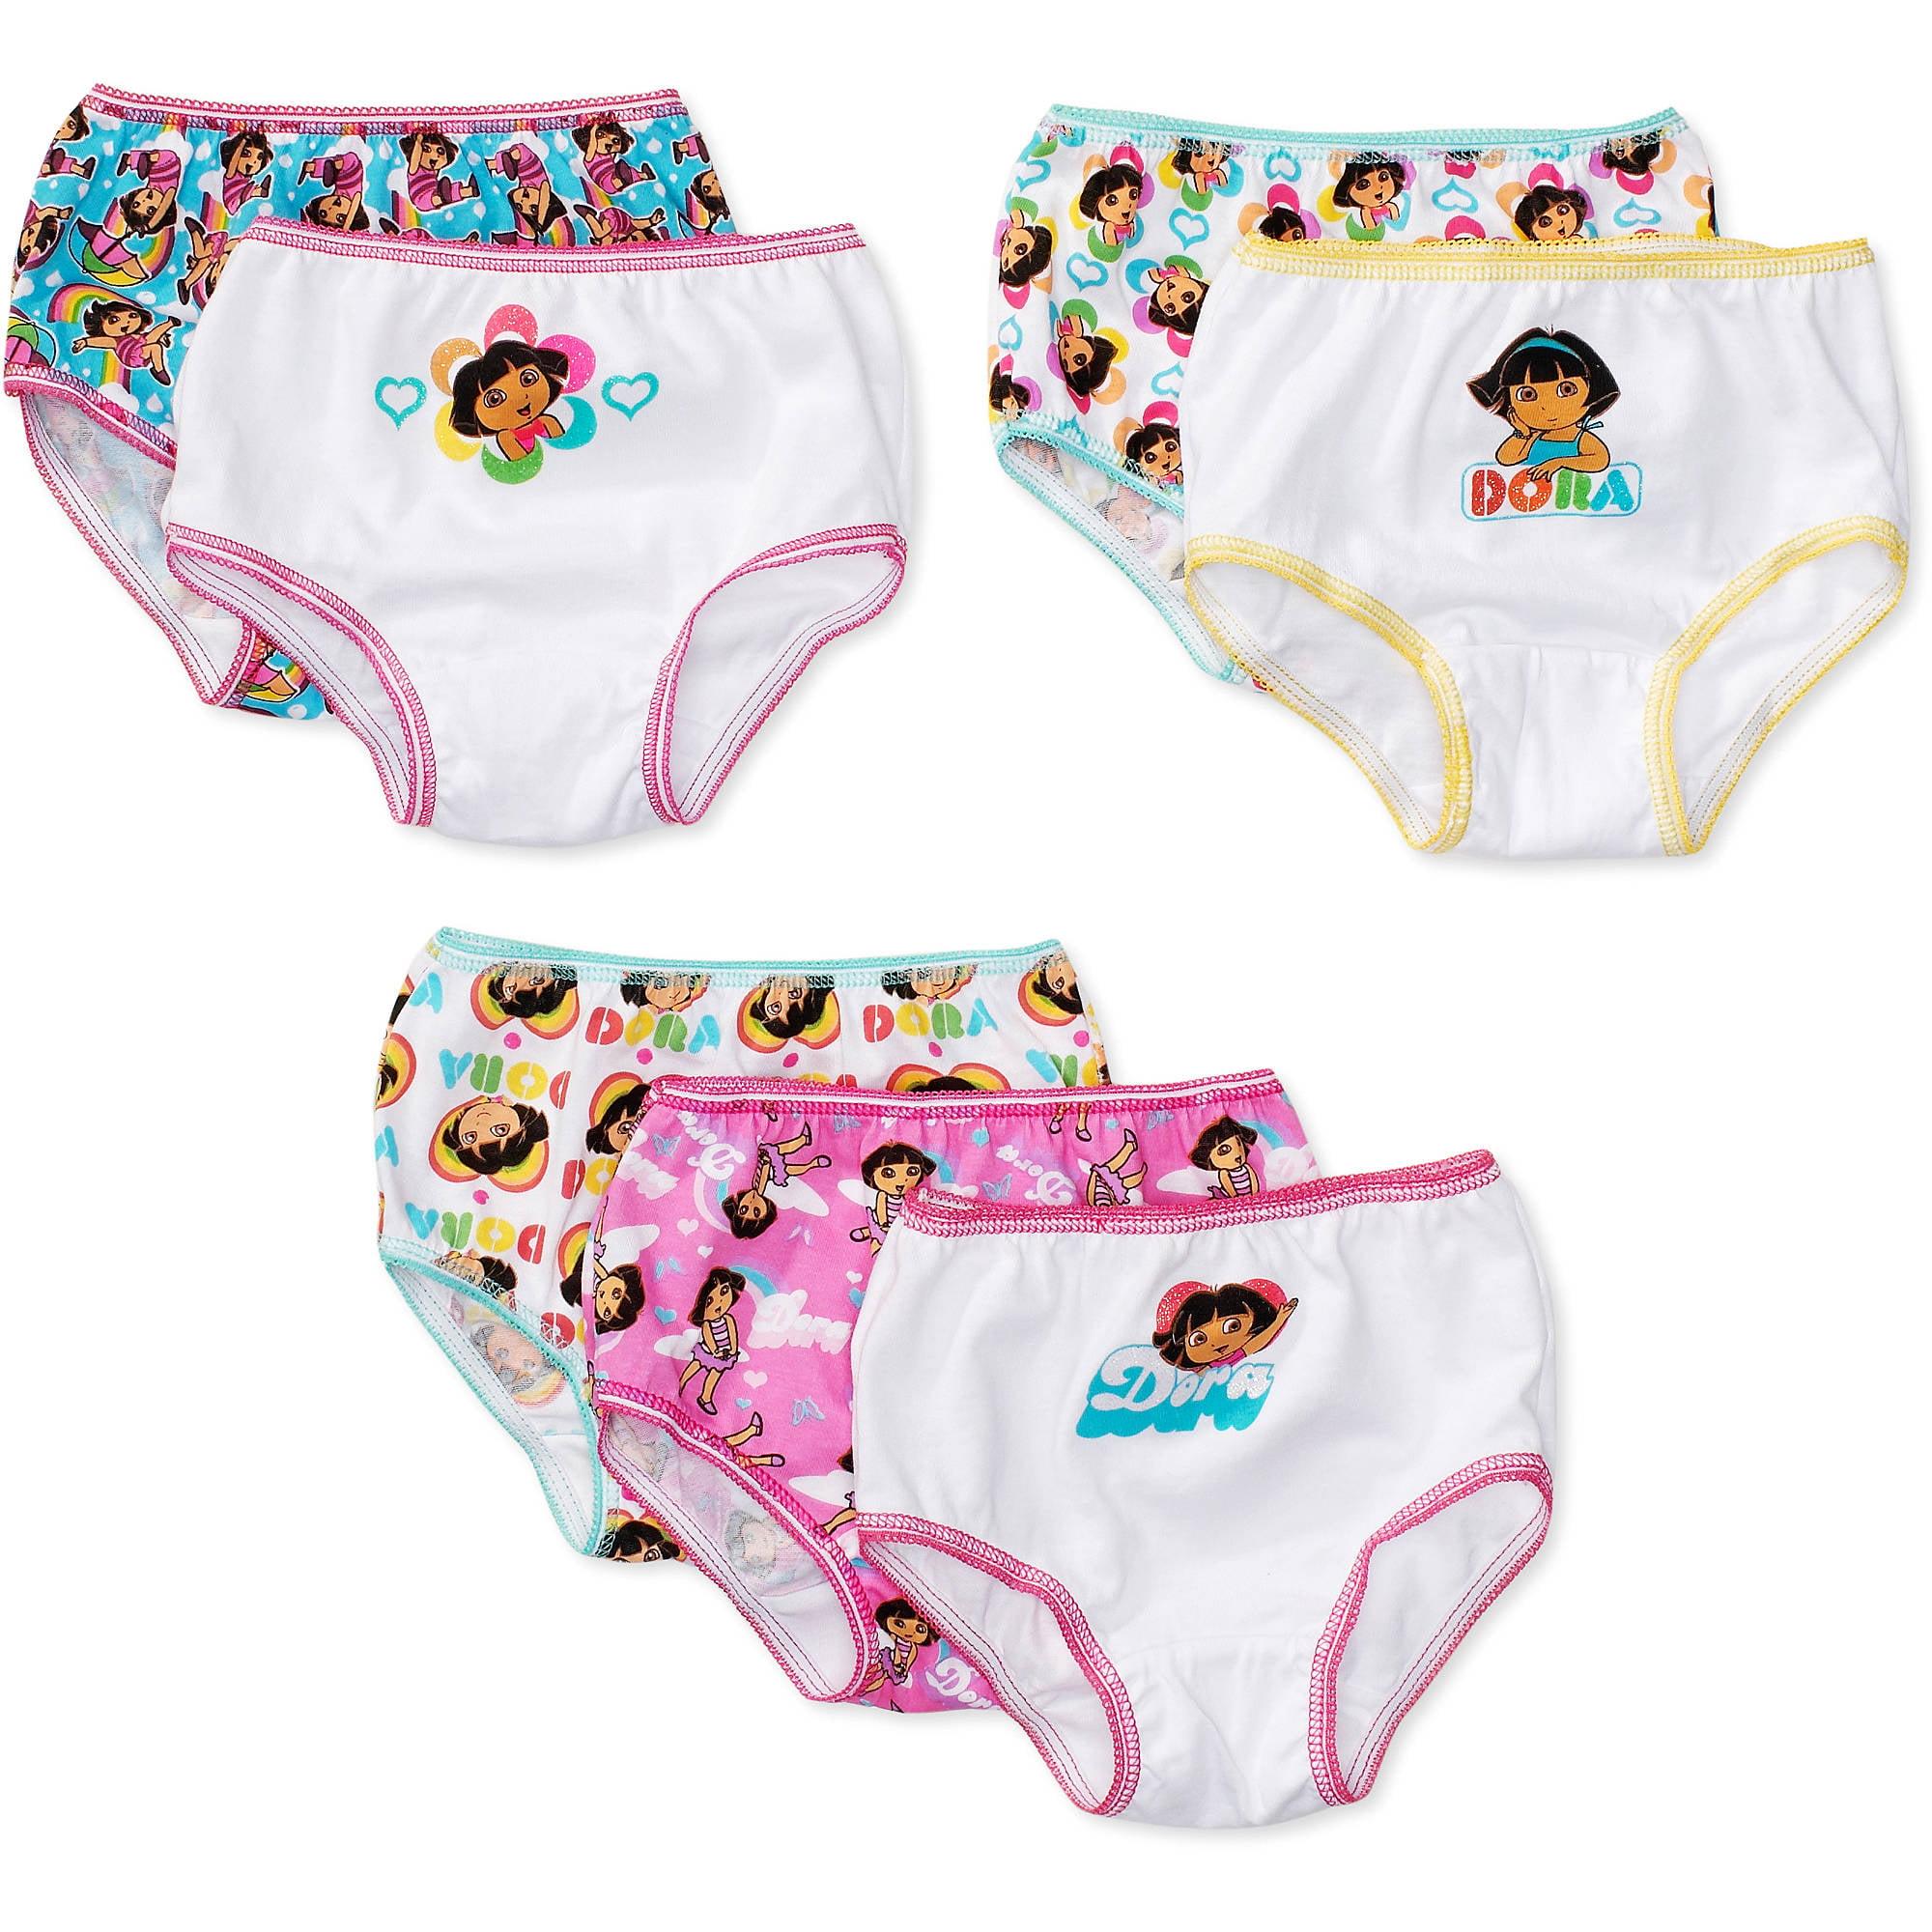 Nickelodeon Toddler Girls' Dora the Explorer Underwear, 7-Pack ...